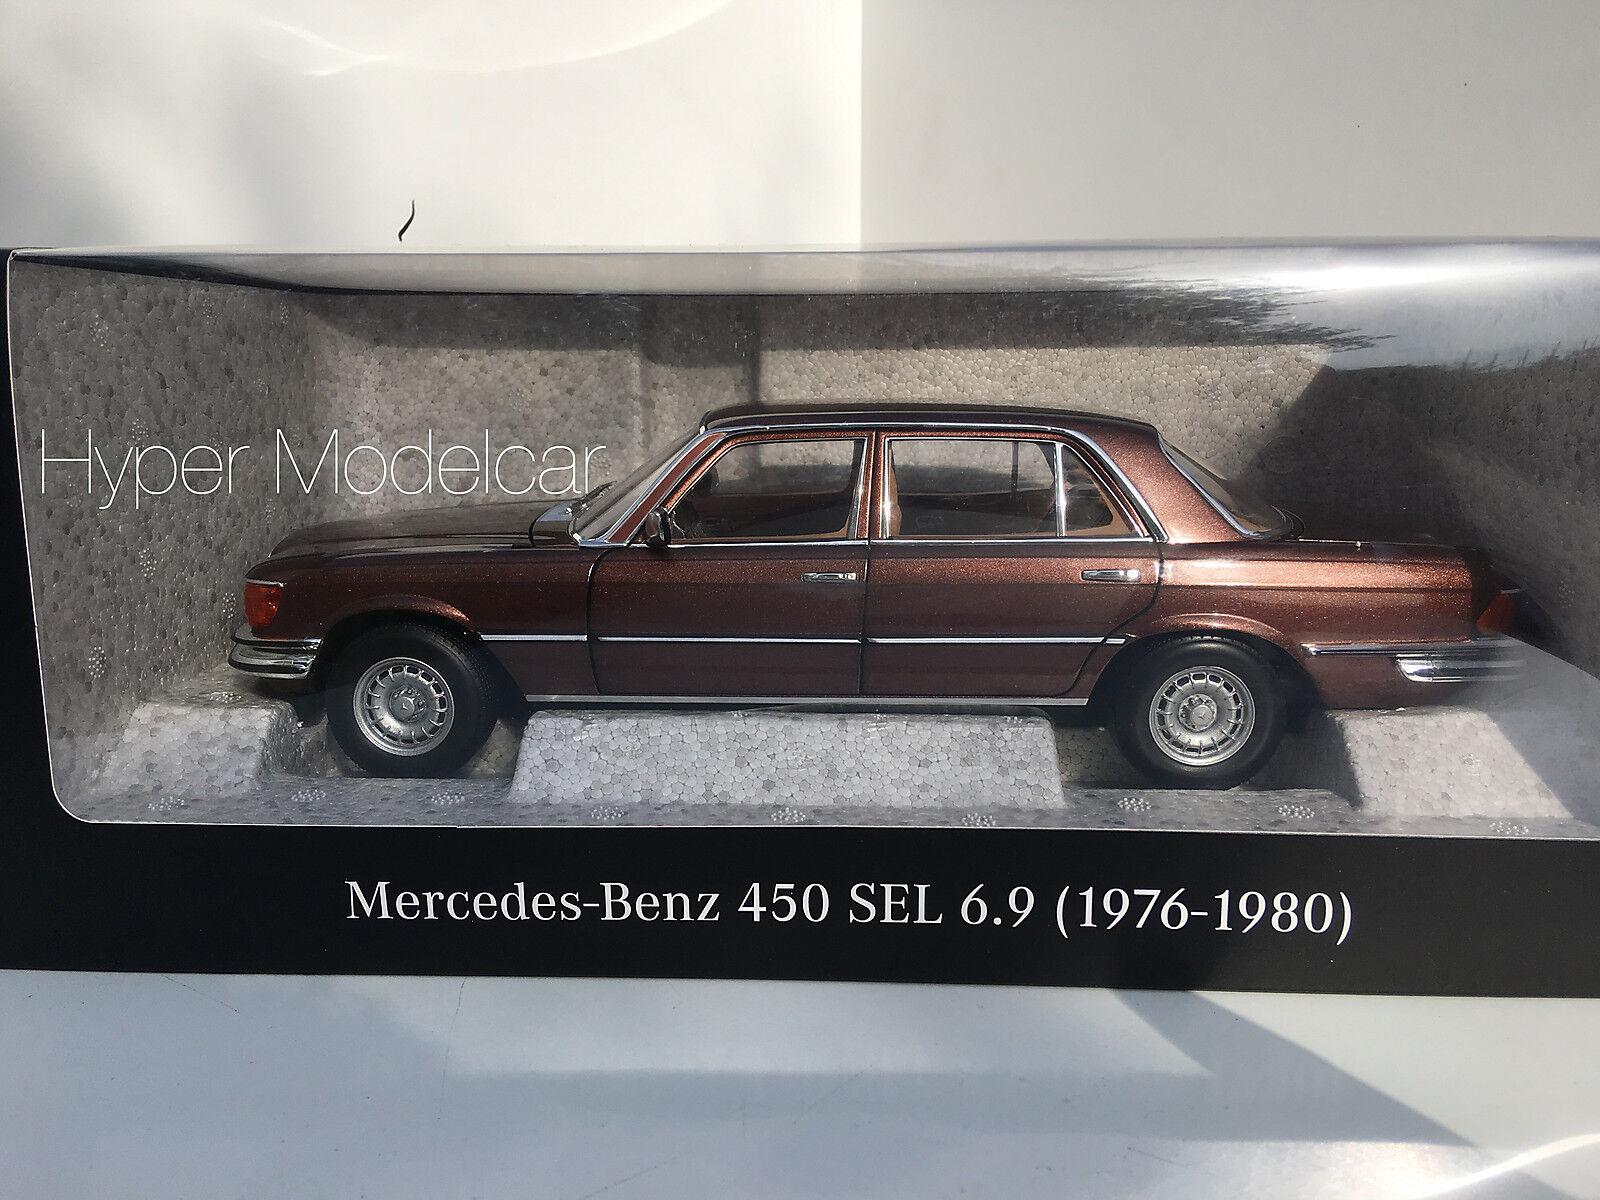 orden en línea NOREV NOREV NOREV 1 18 Mercedes Benz S-Class 450 SEL 6.9 (W116) 1976 Bronze Met.  B66040643  gran venta